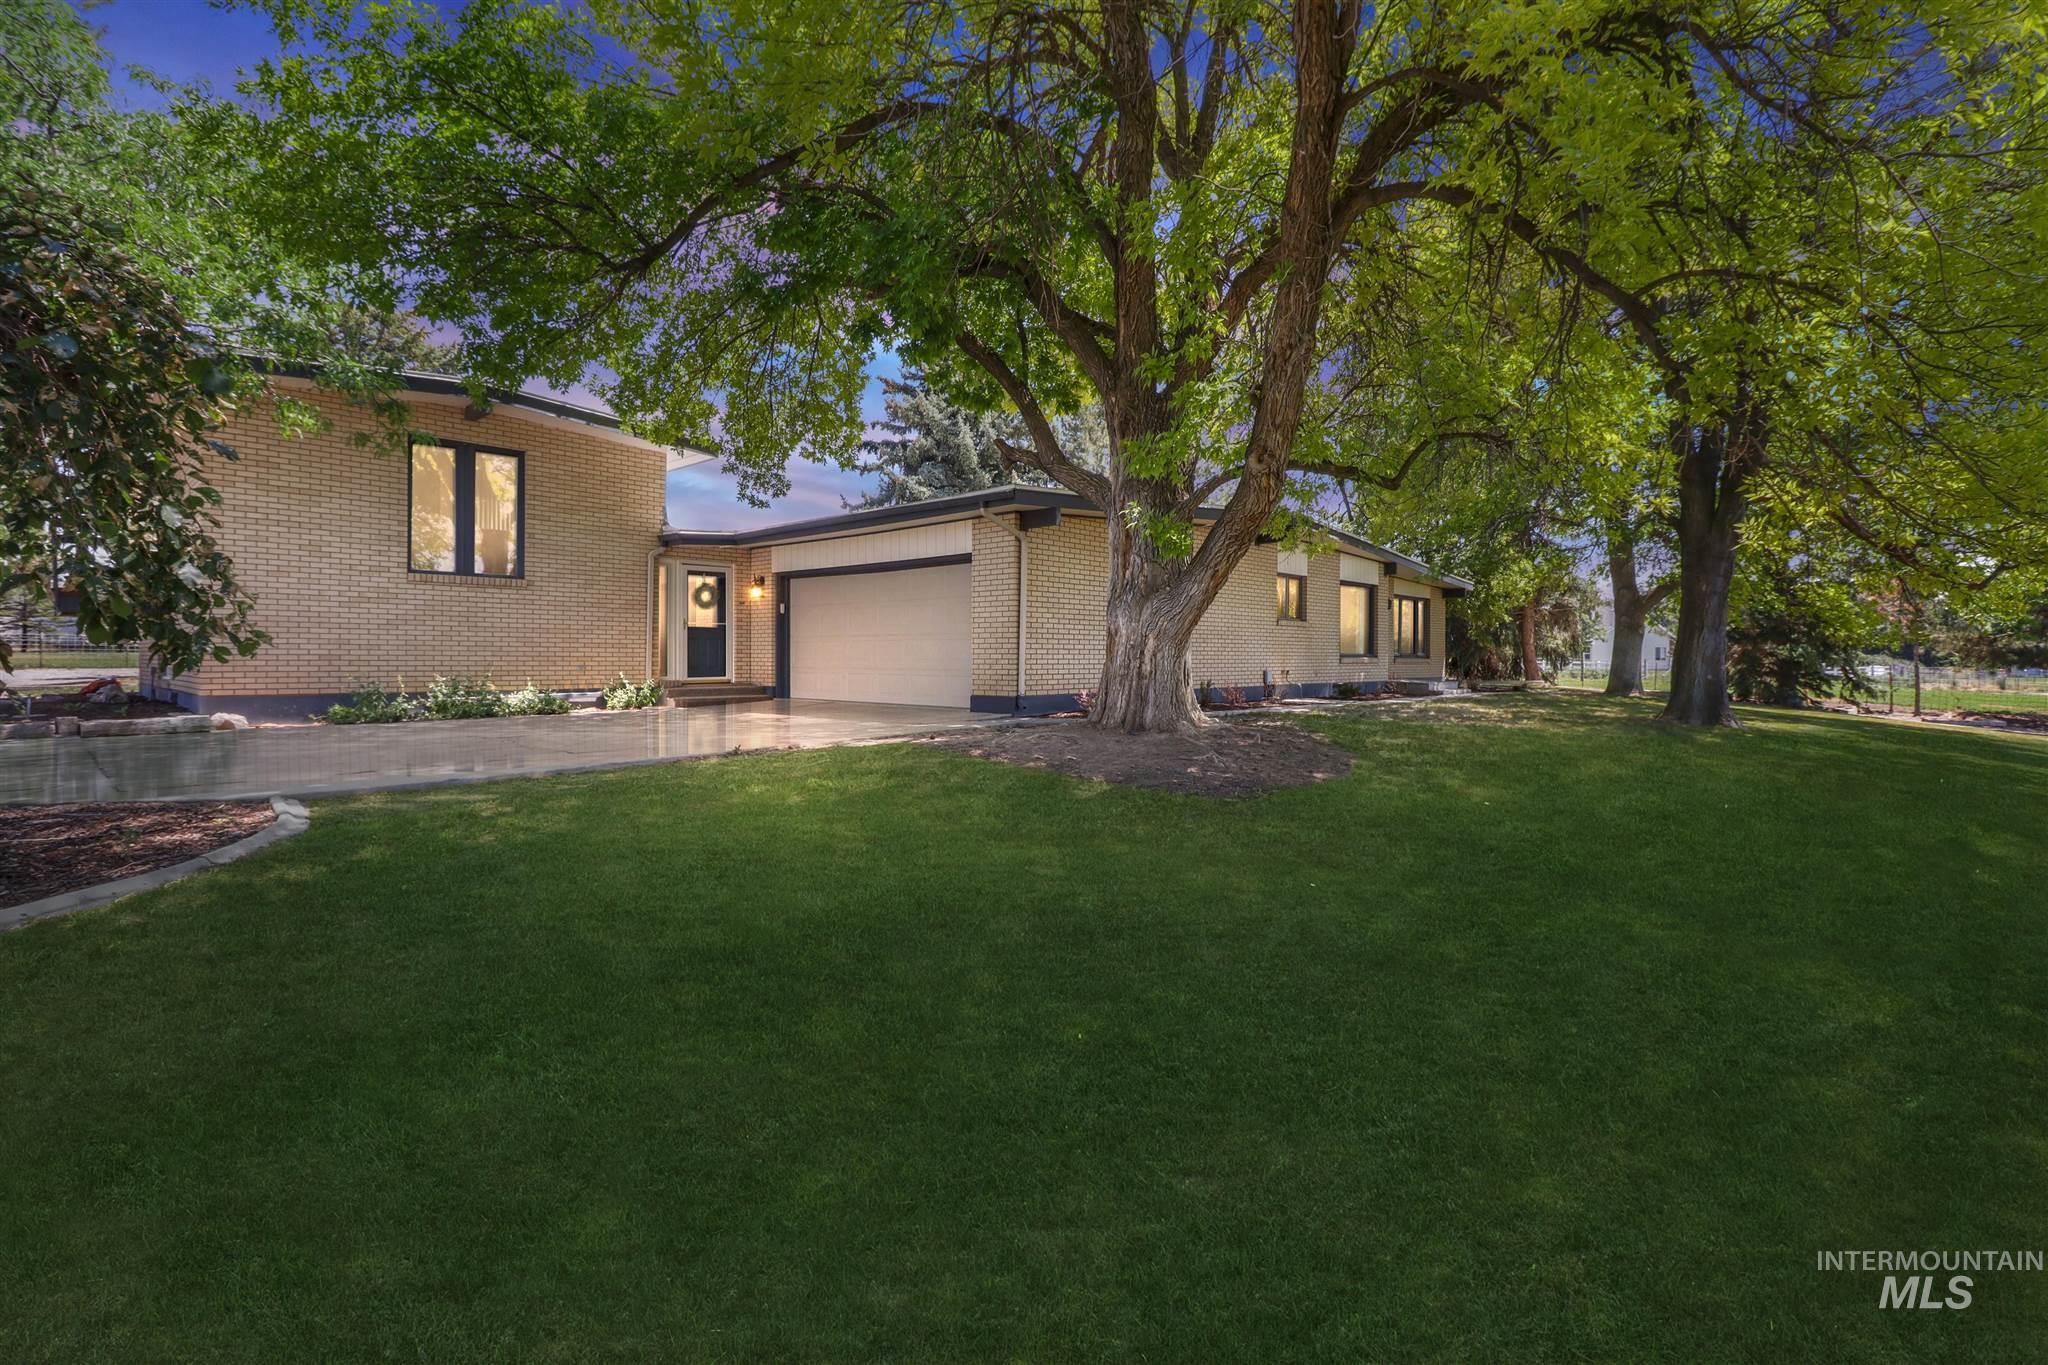 394 Hankins N Property Photo 1